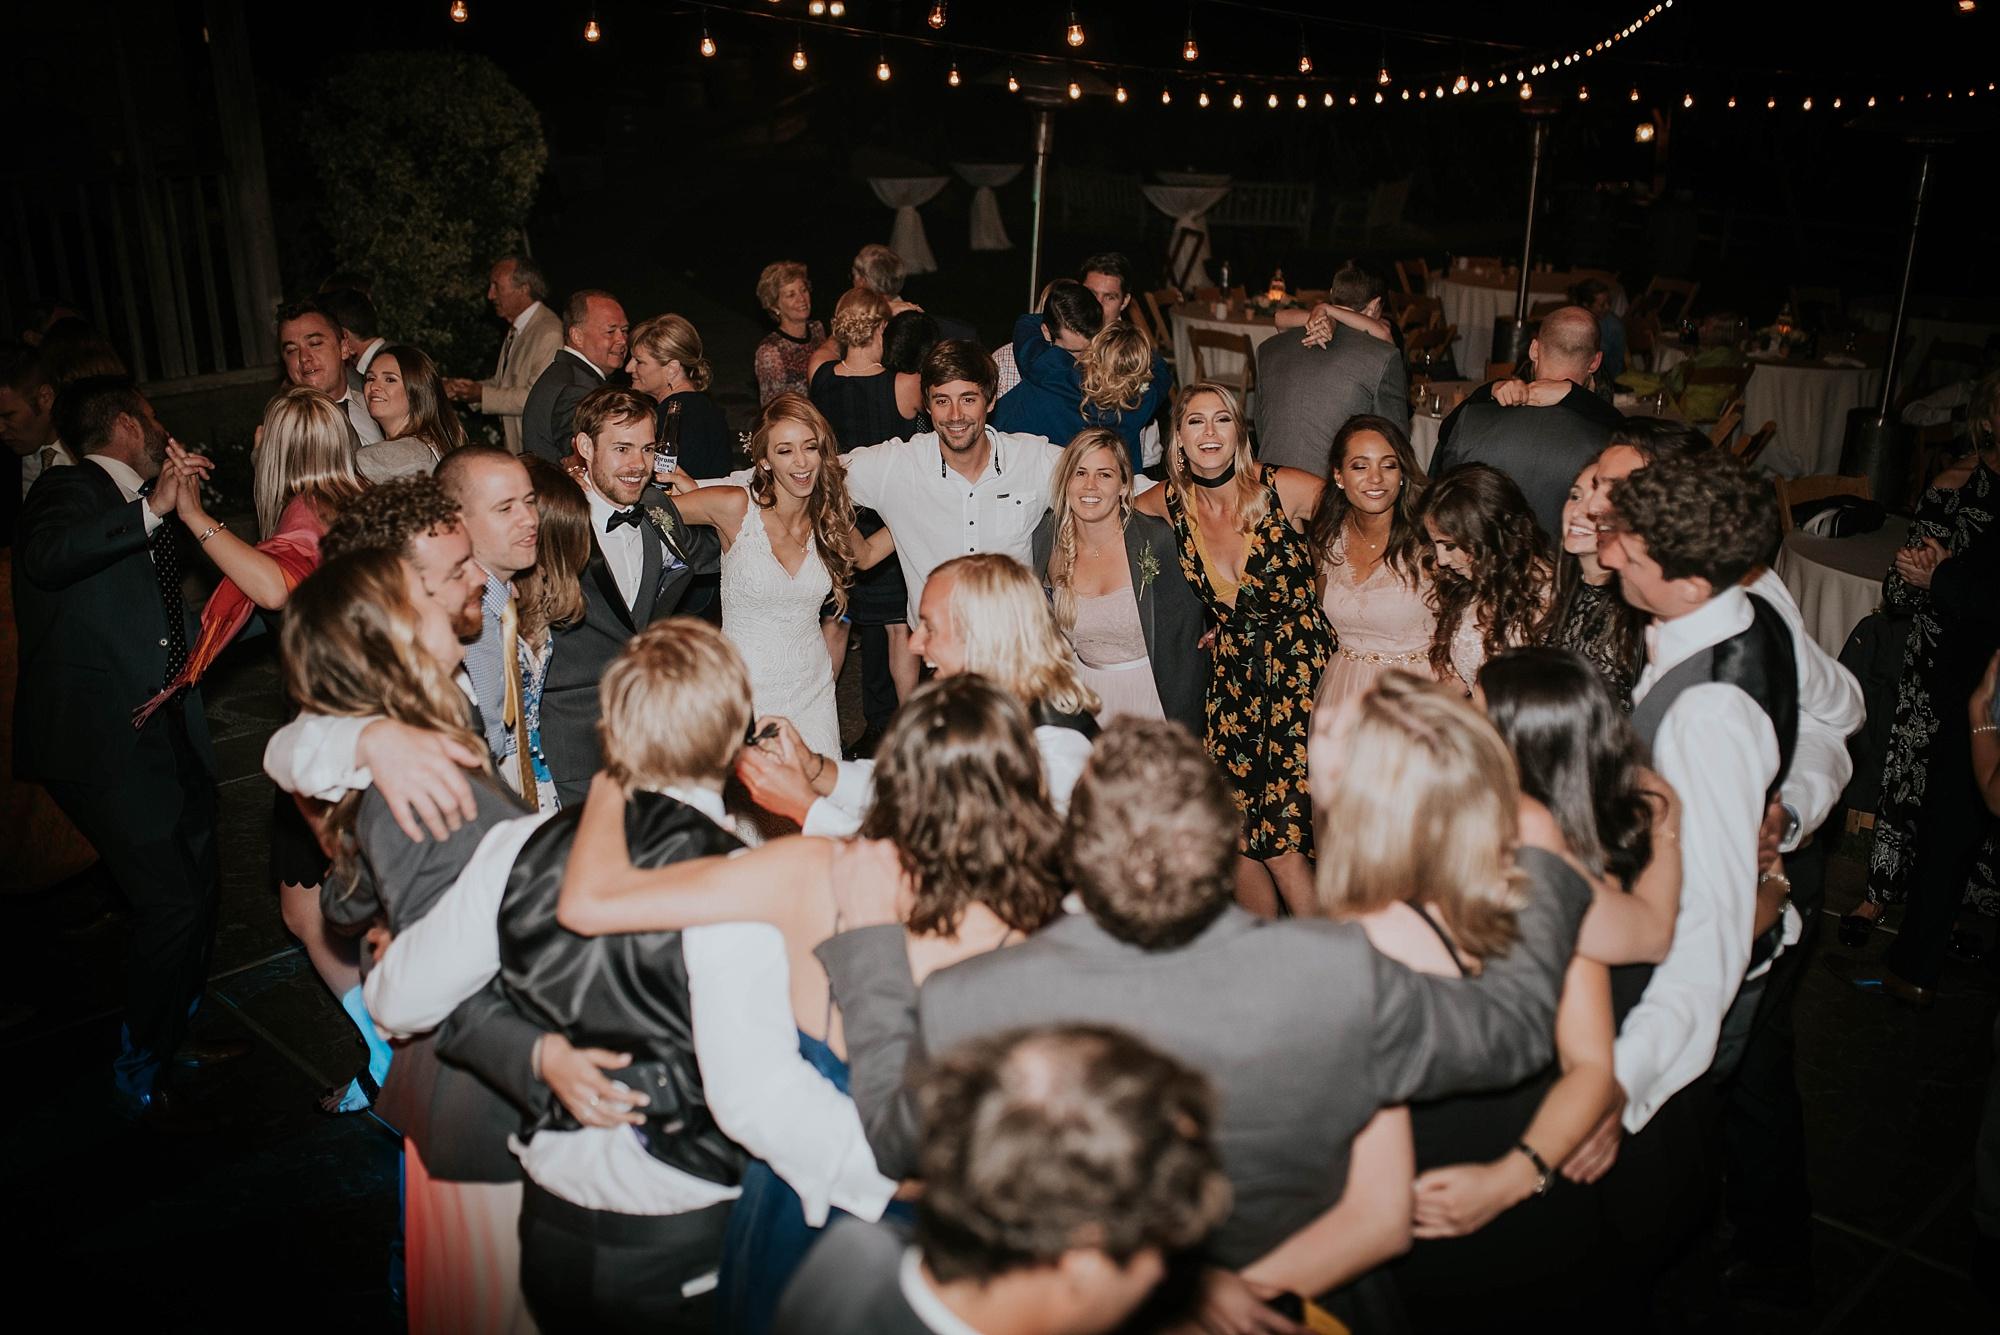 Dance party kicks off at temcula creek inn wedding in california